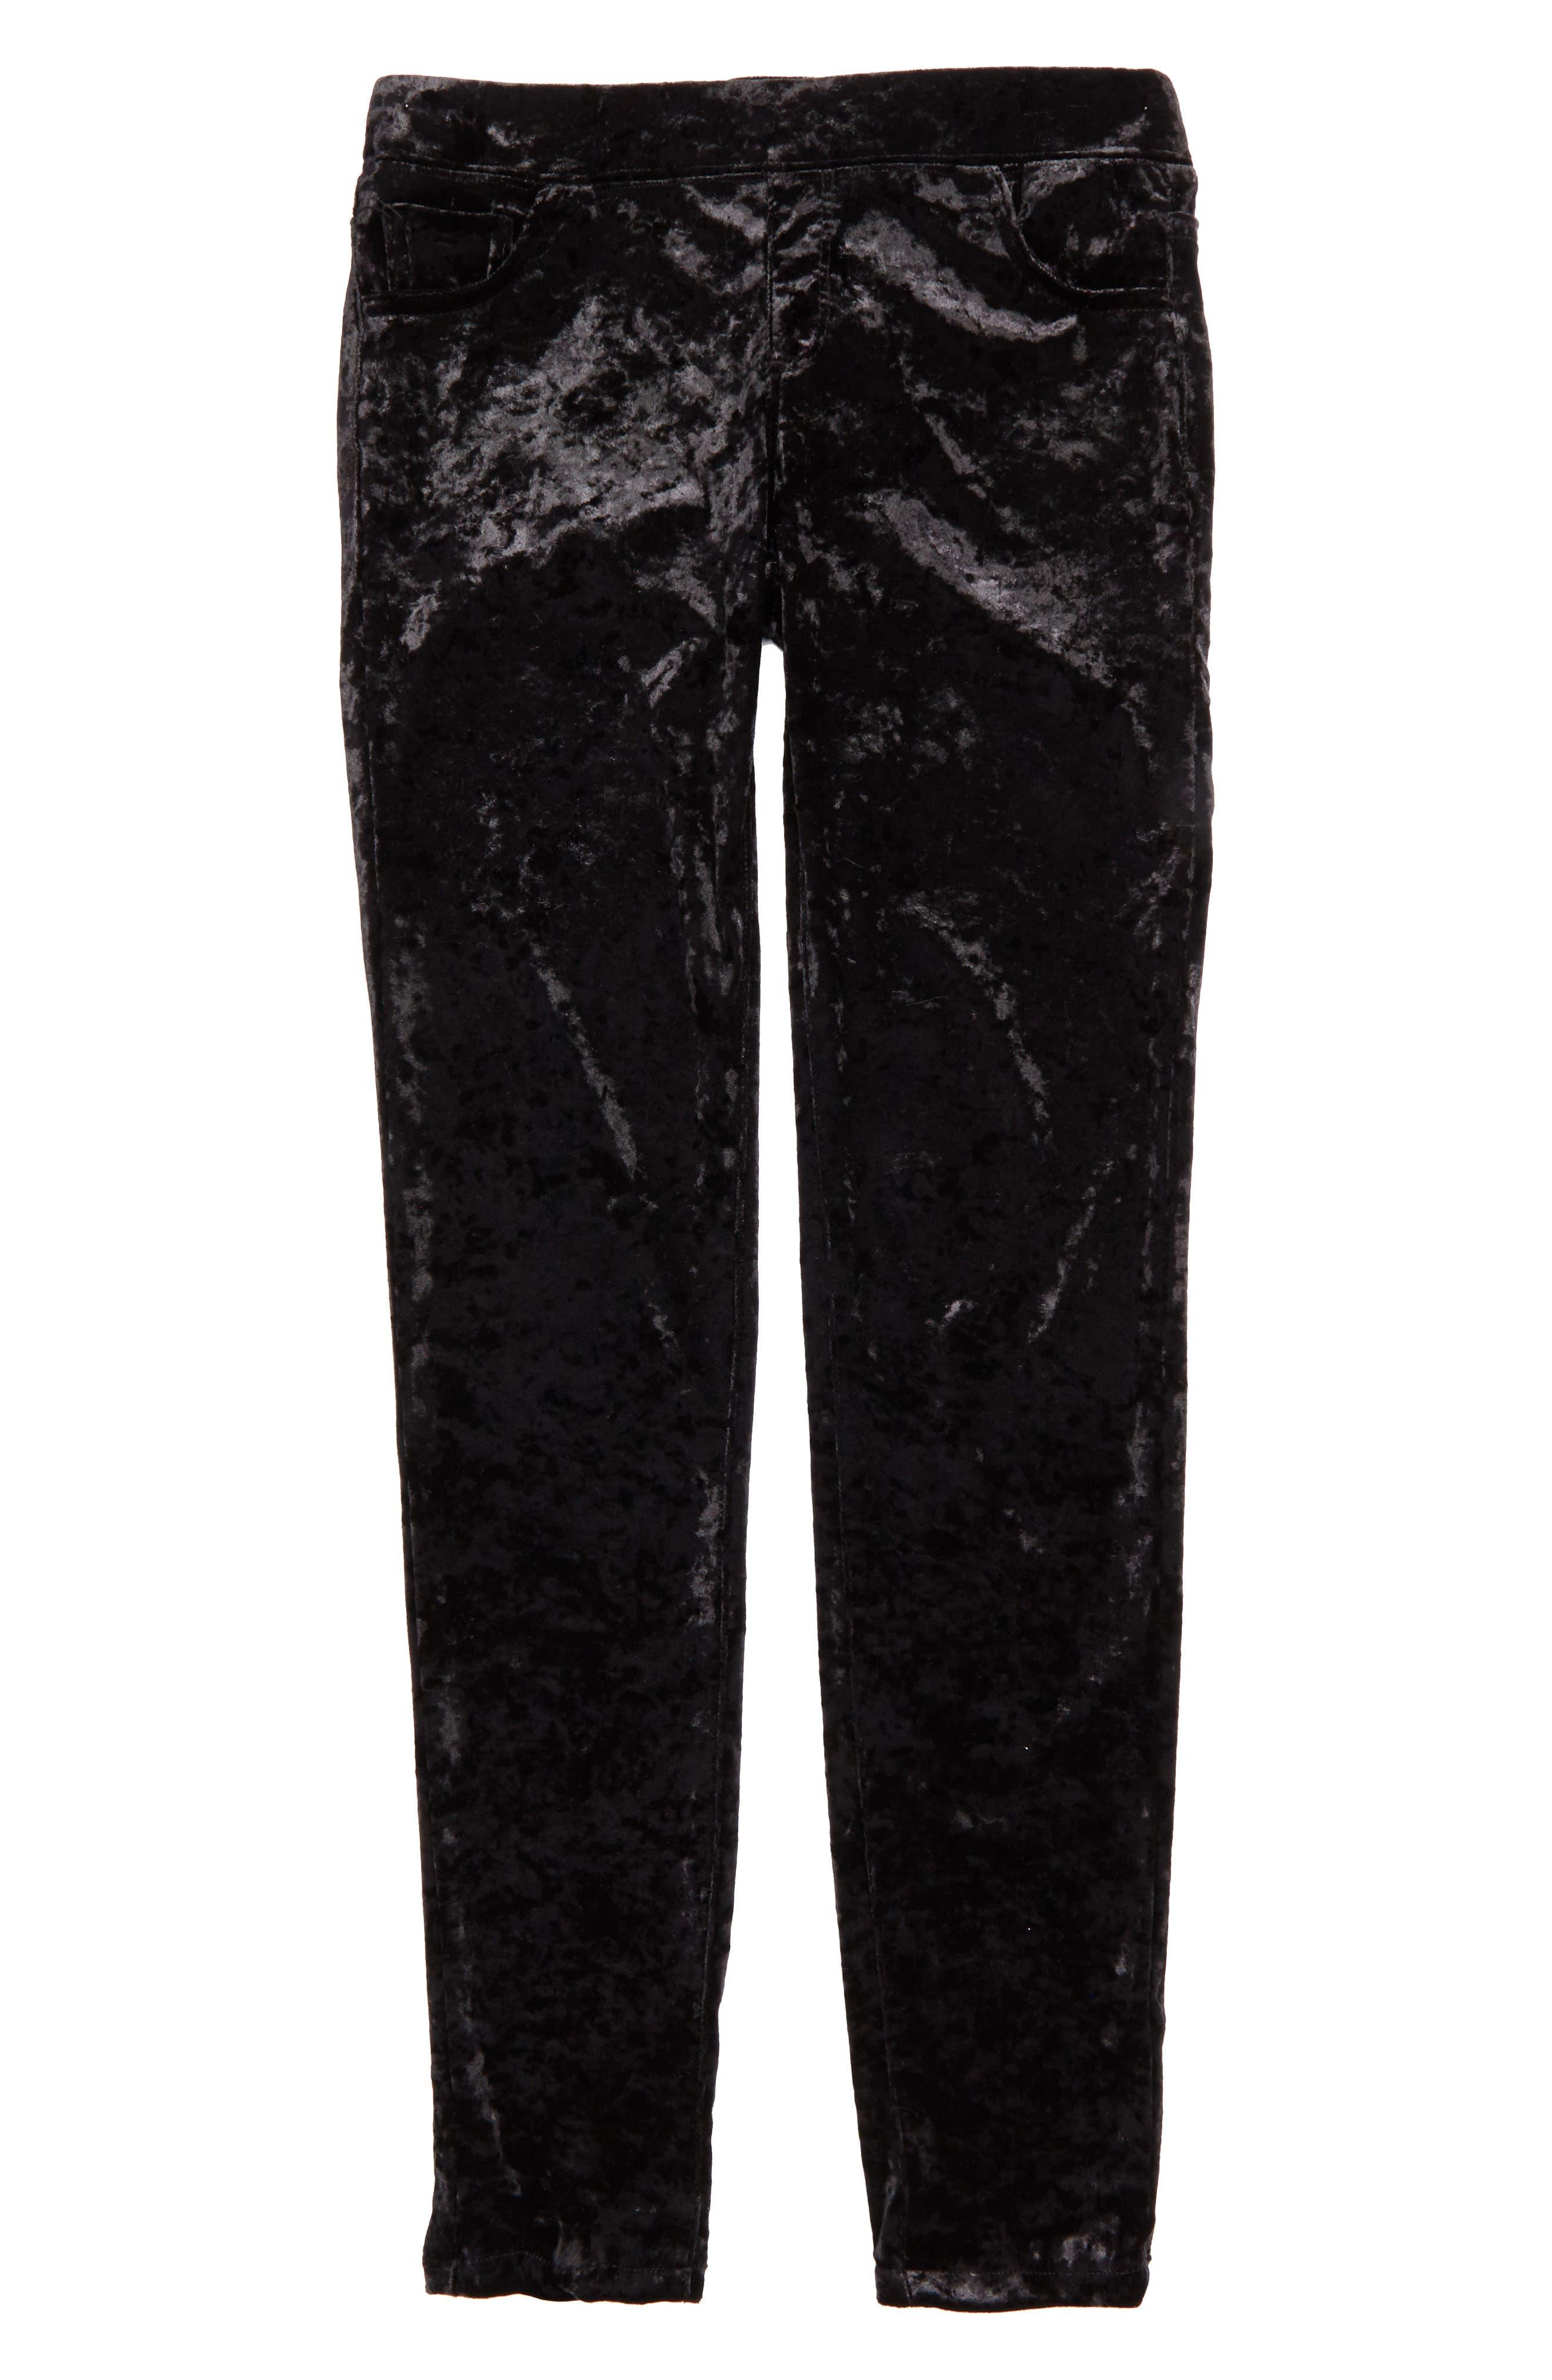 Crushed Velvet Skinny Pants,                         Main,                         color, Black